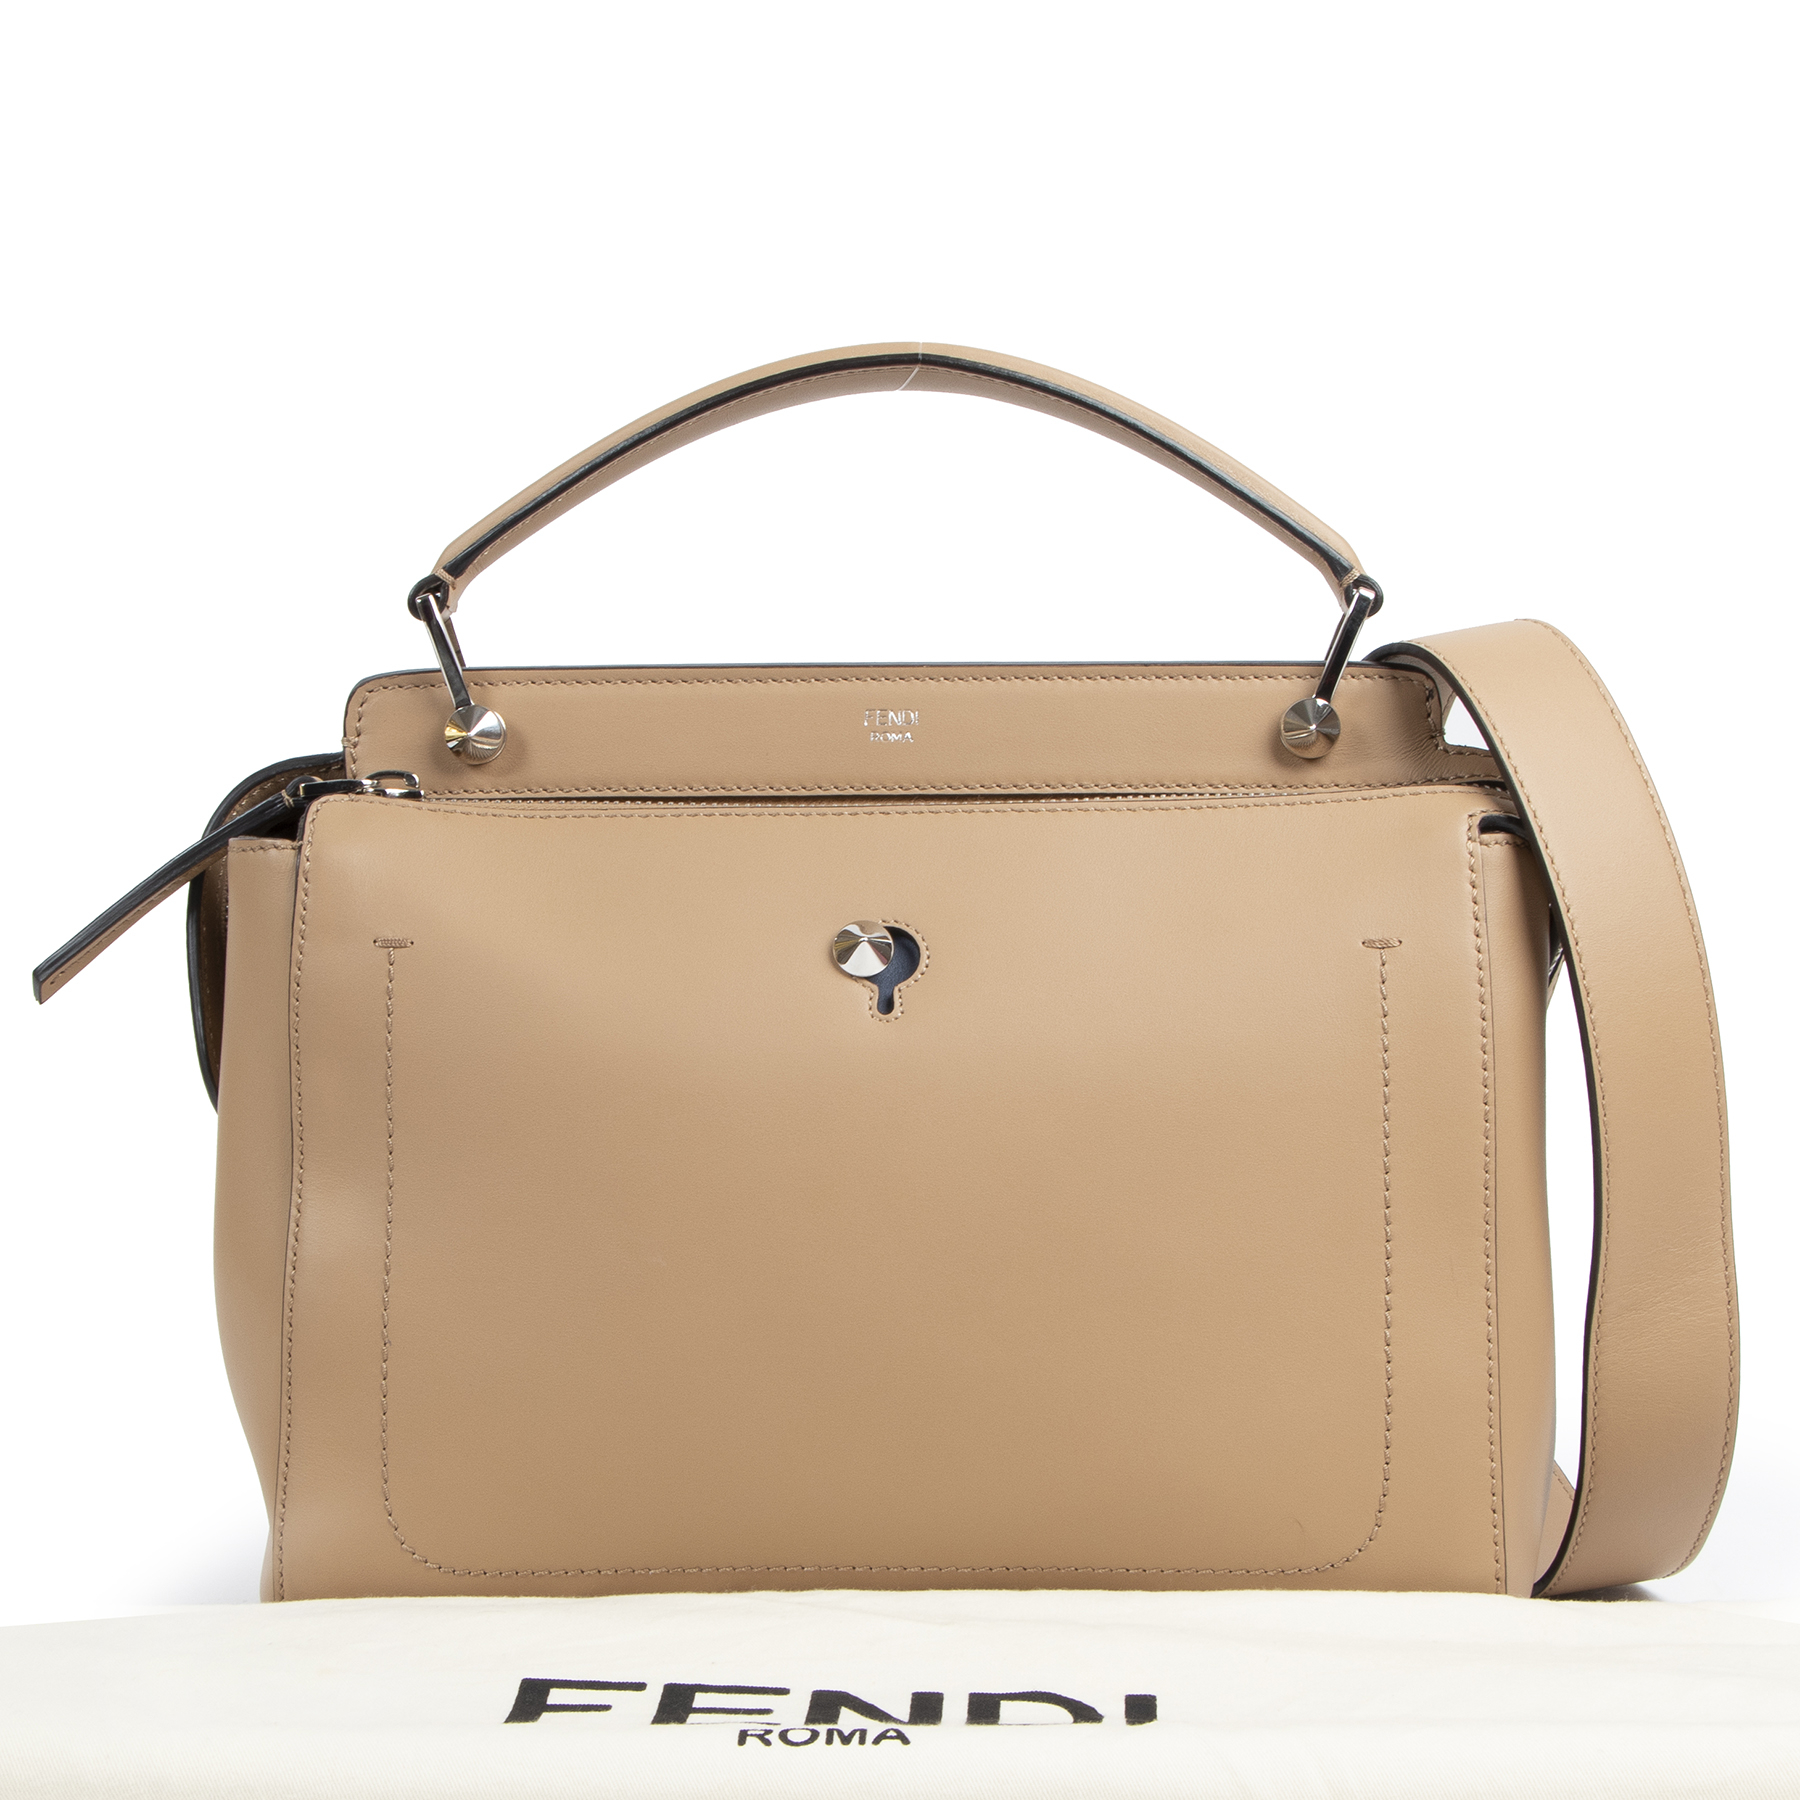 Fendi Beige Leather Dotcom Top Handle Bag